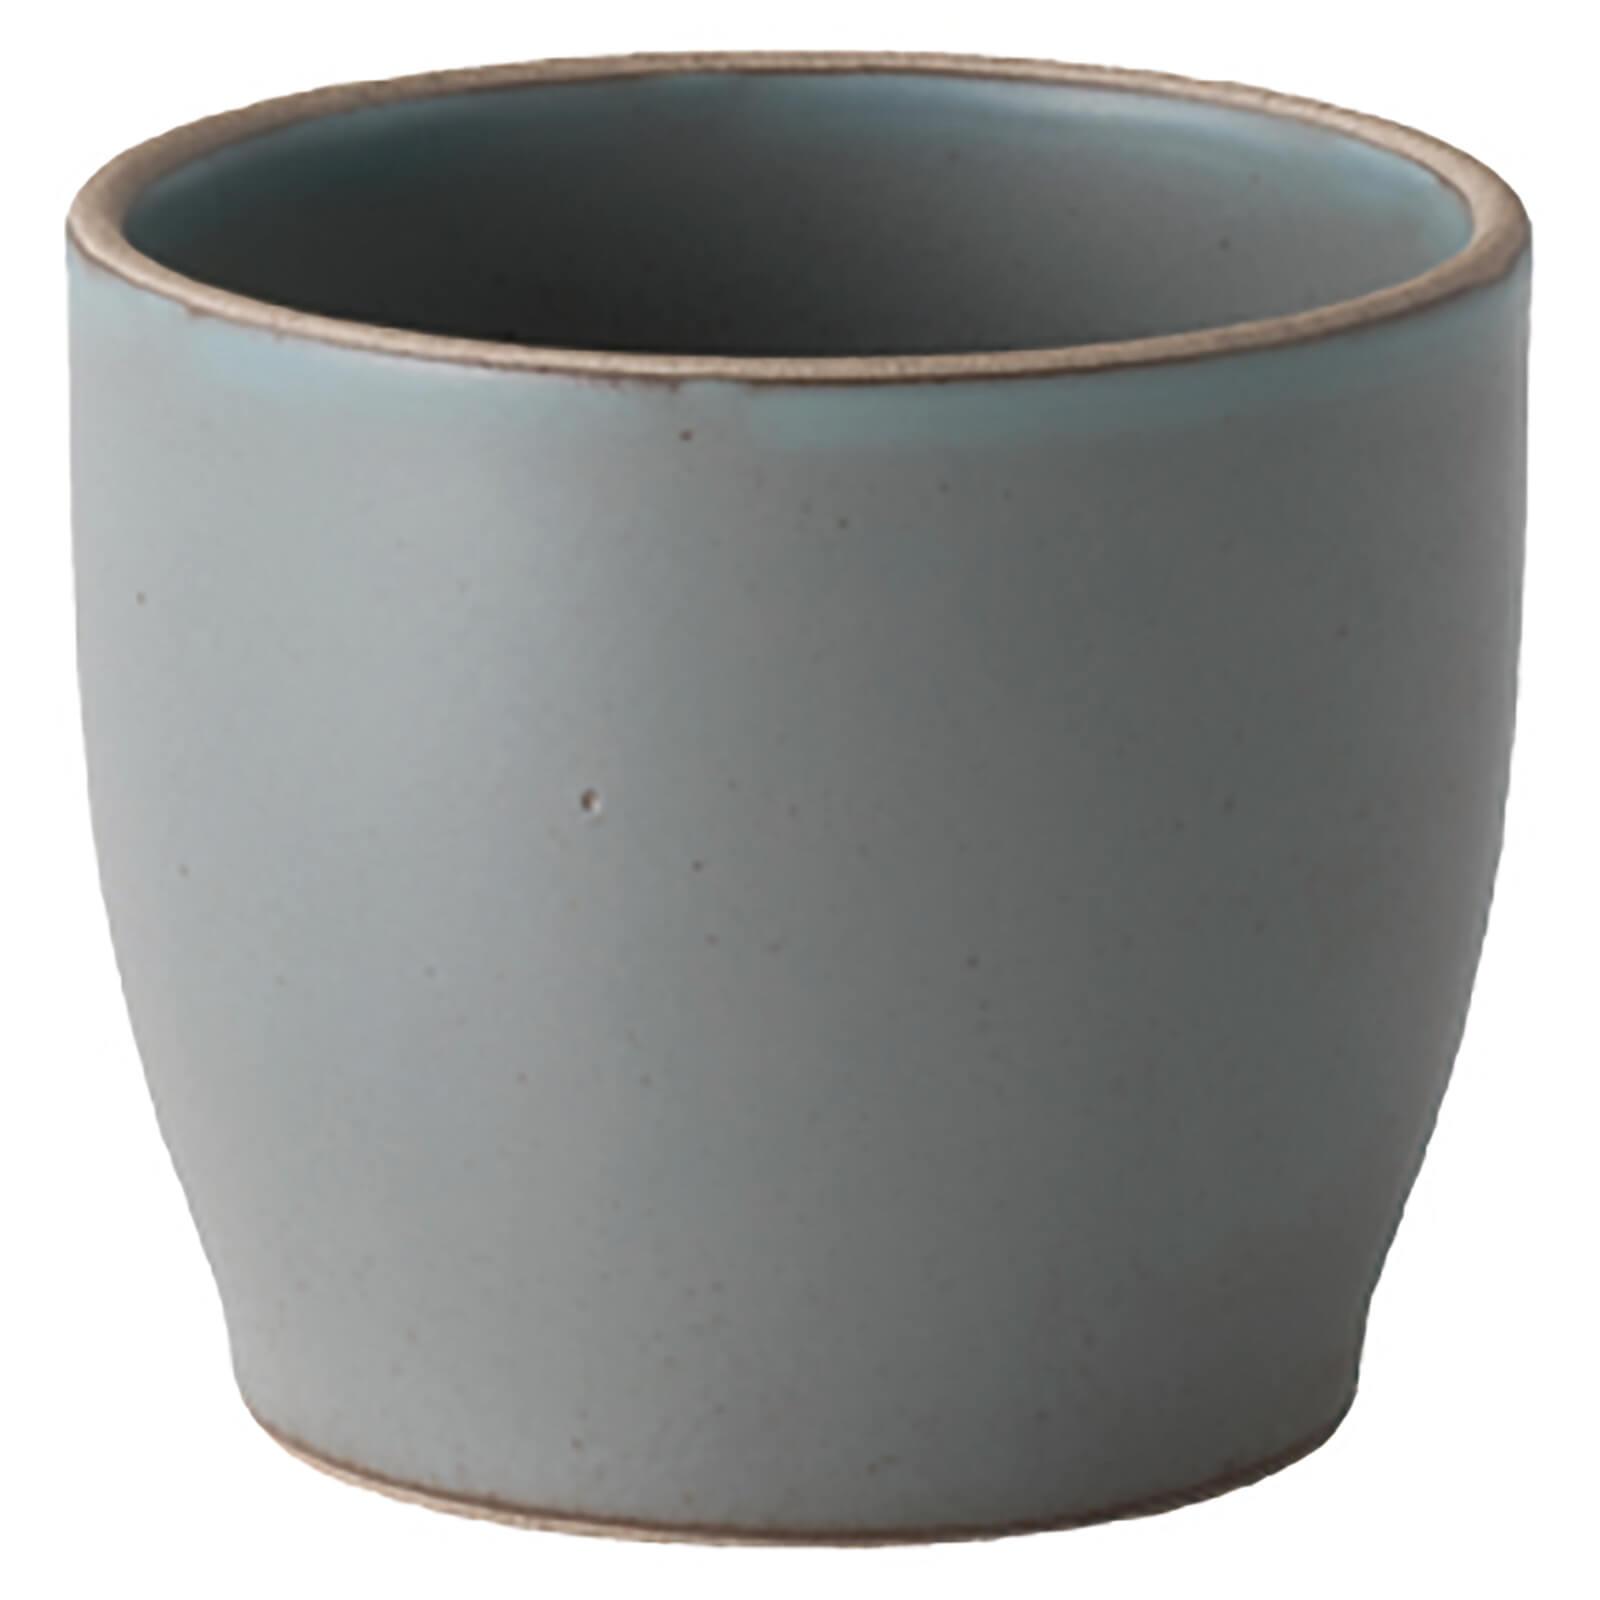 Kinto Nori Tumbler - 200ml - Blue Grey